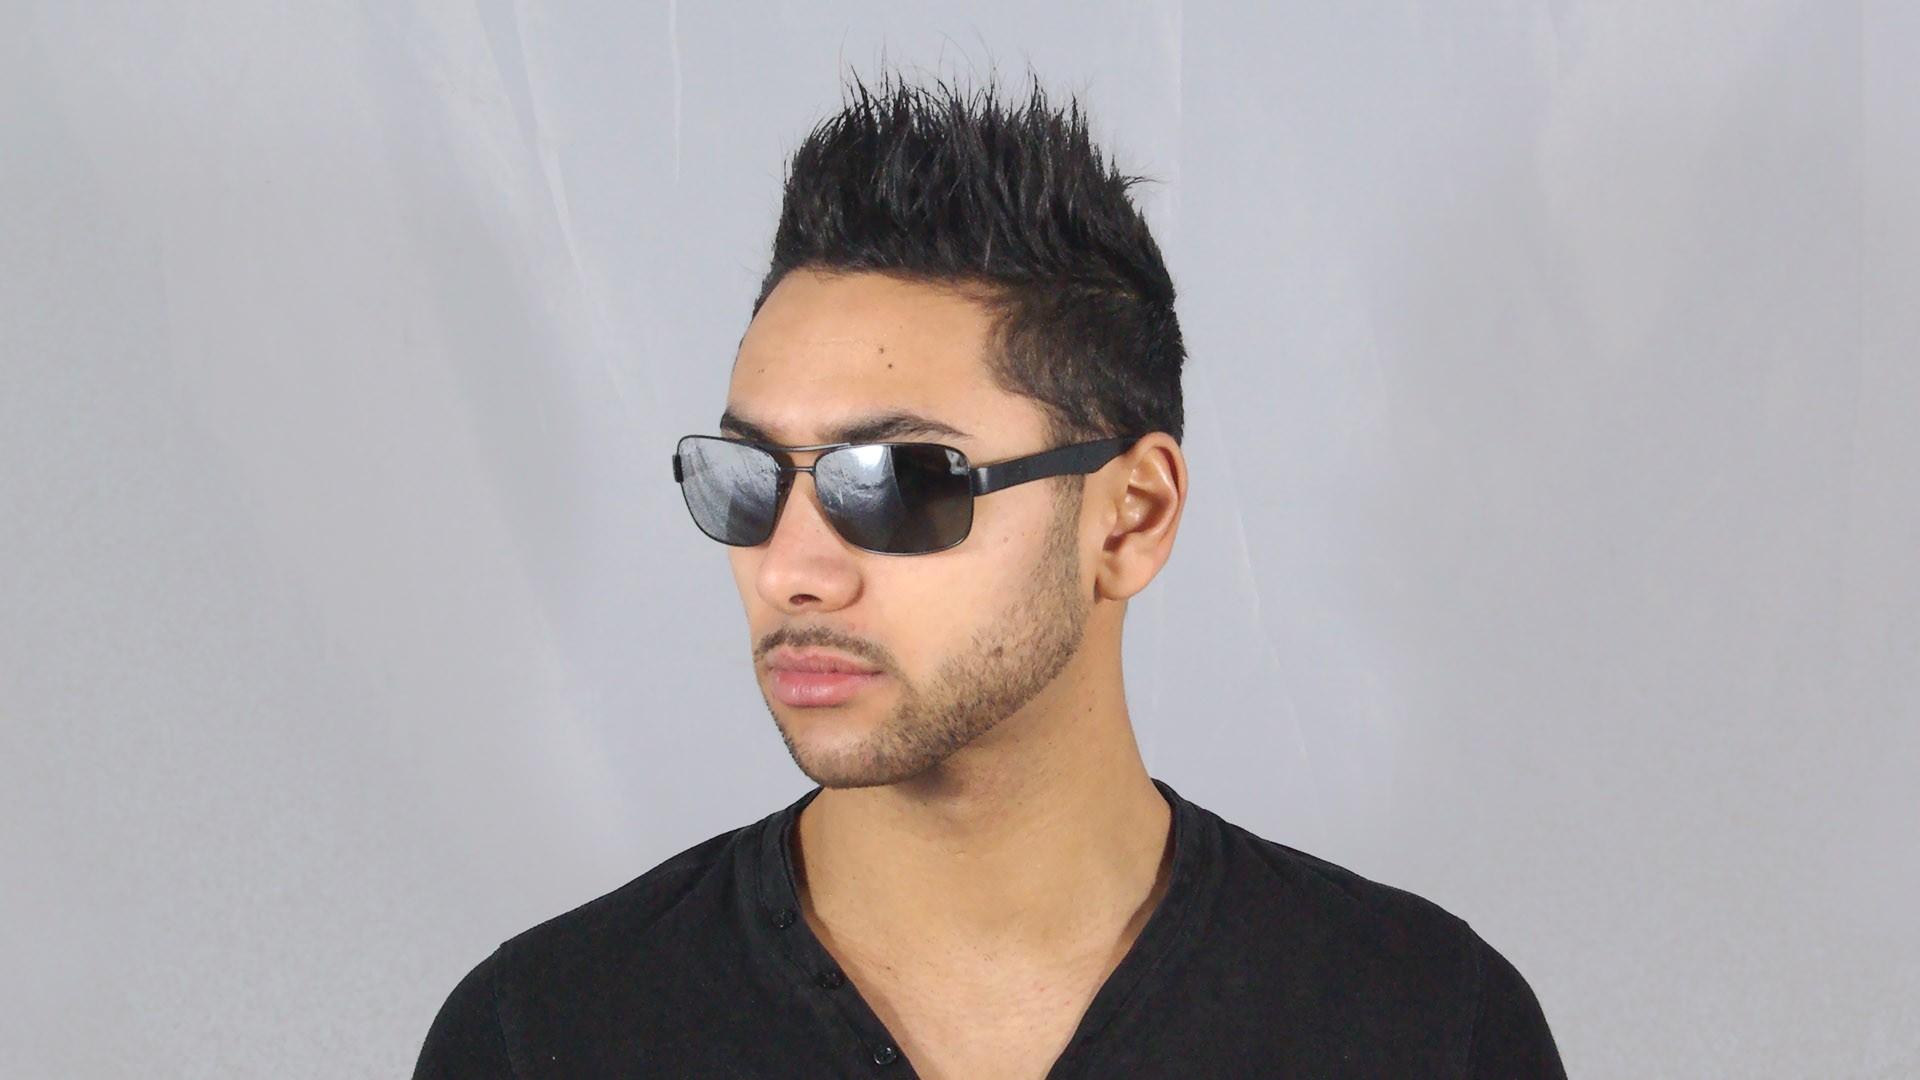 15aec2fde8 Sunglasses Ray-Ban RB3522 006 82 61-17 Black Medium Polarized Mirror